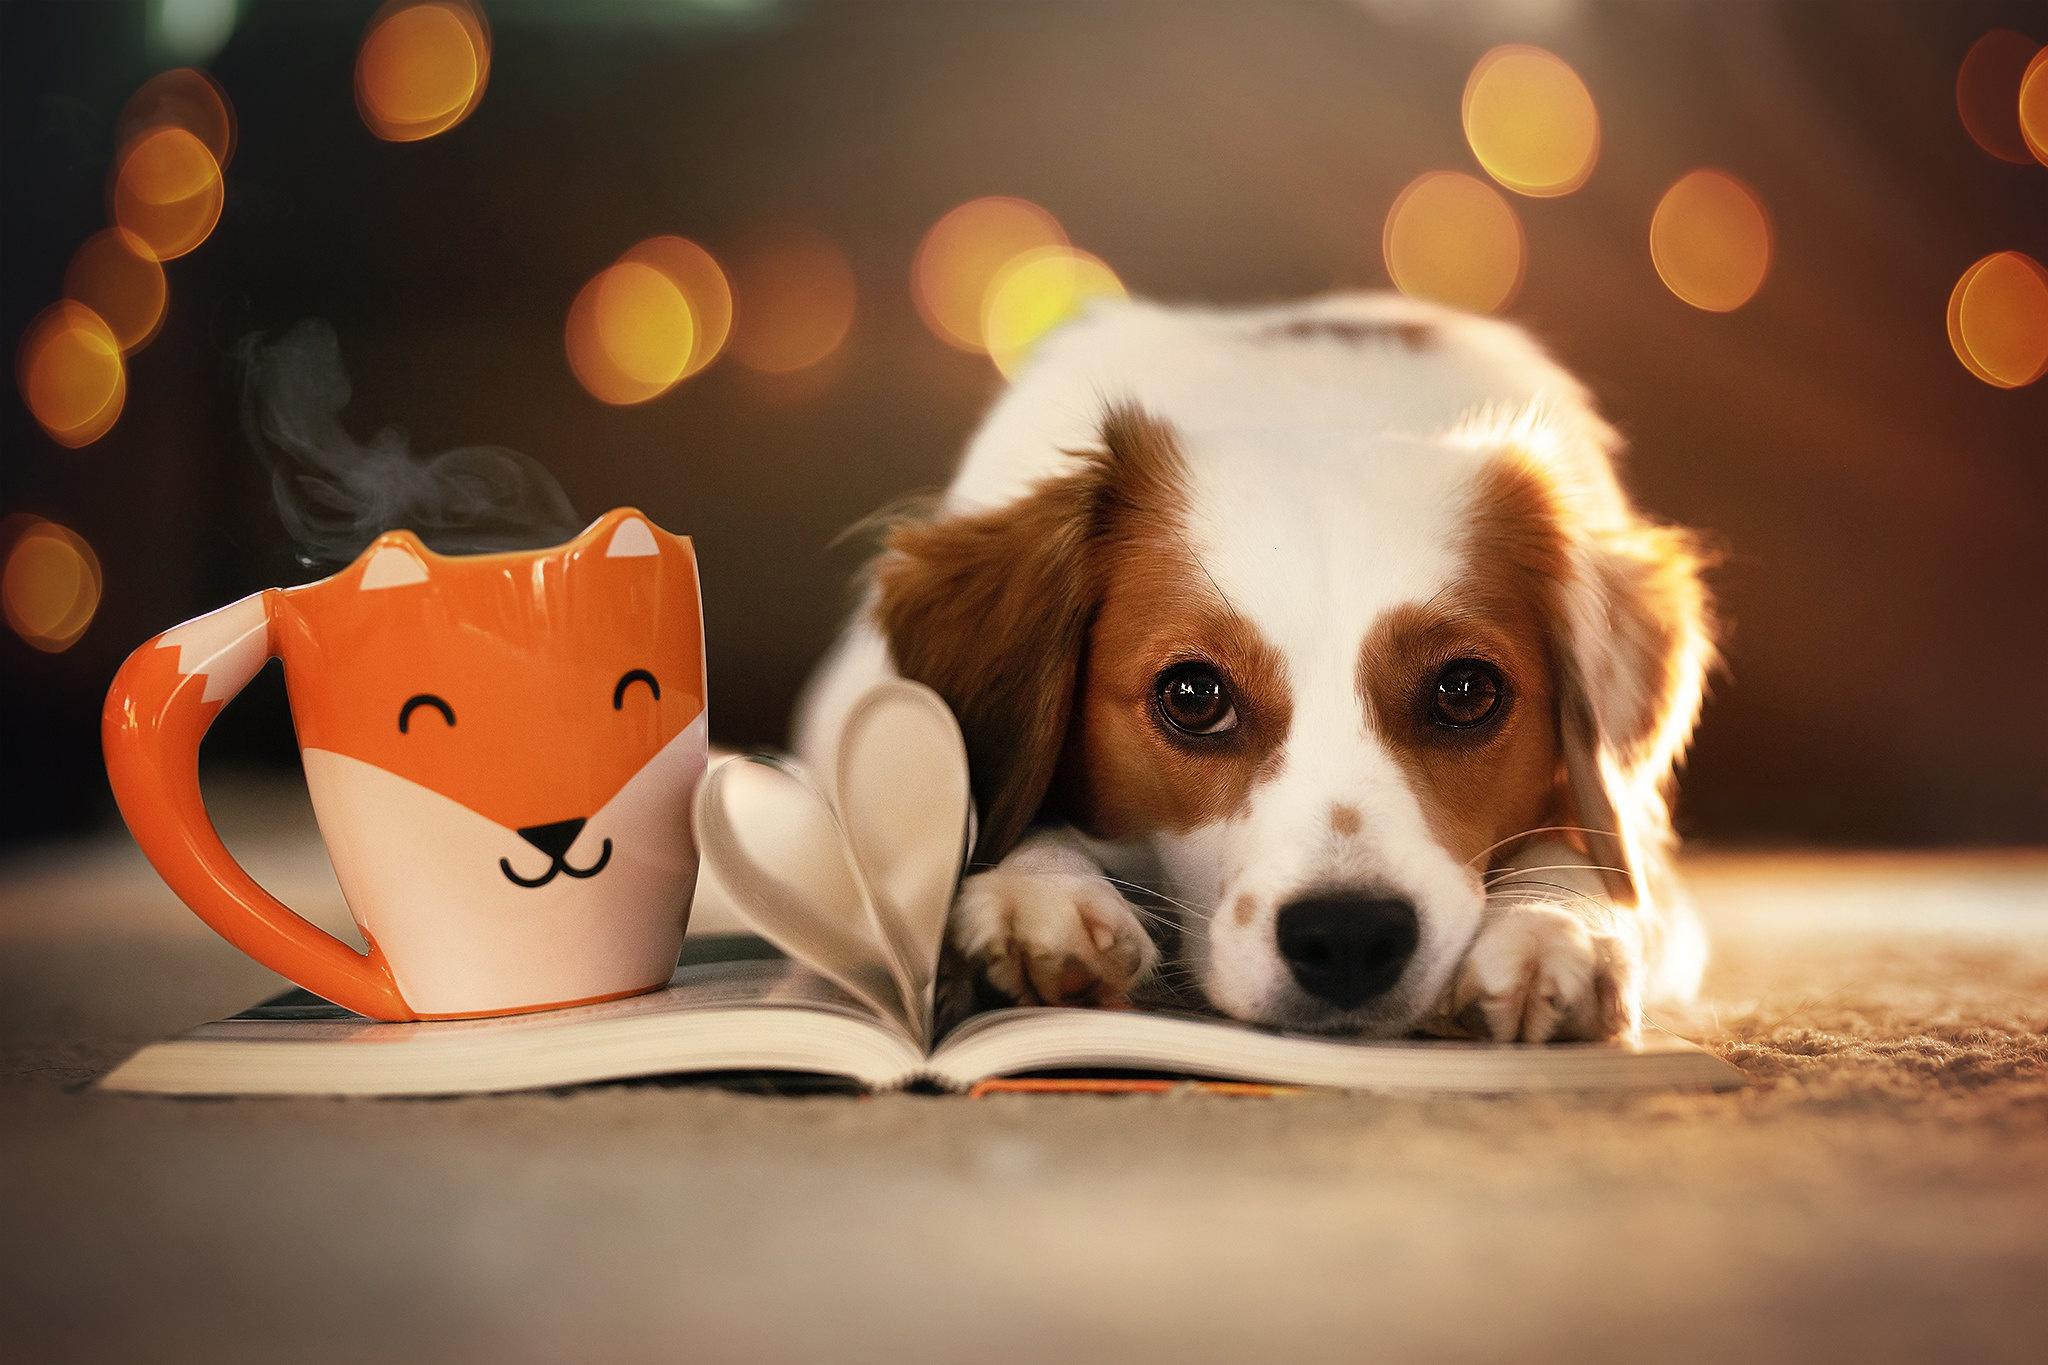 Bokeh Cup Dog Pet 2048x1365